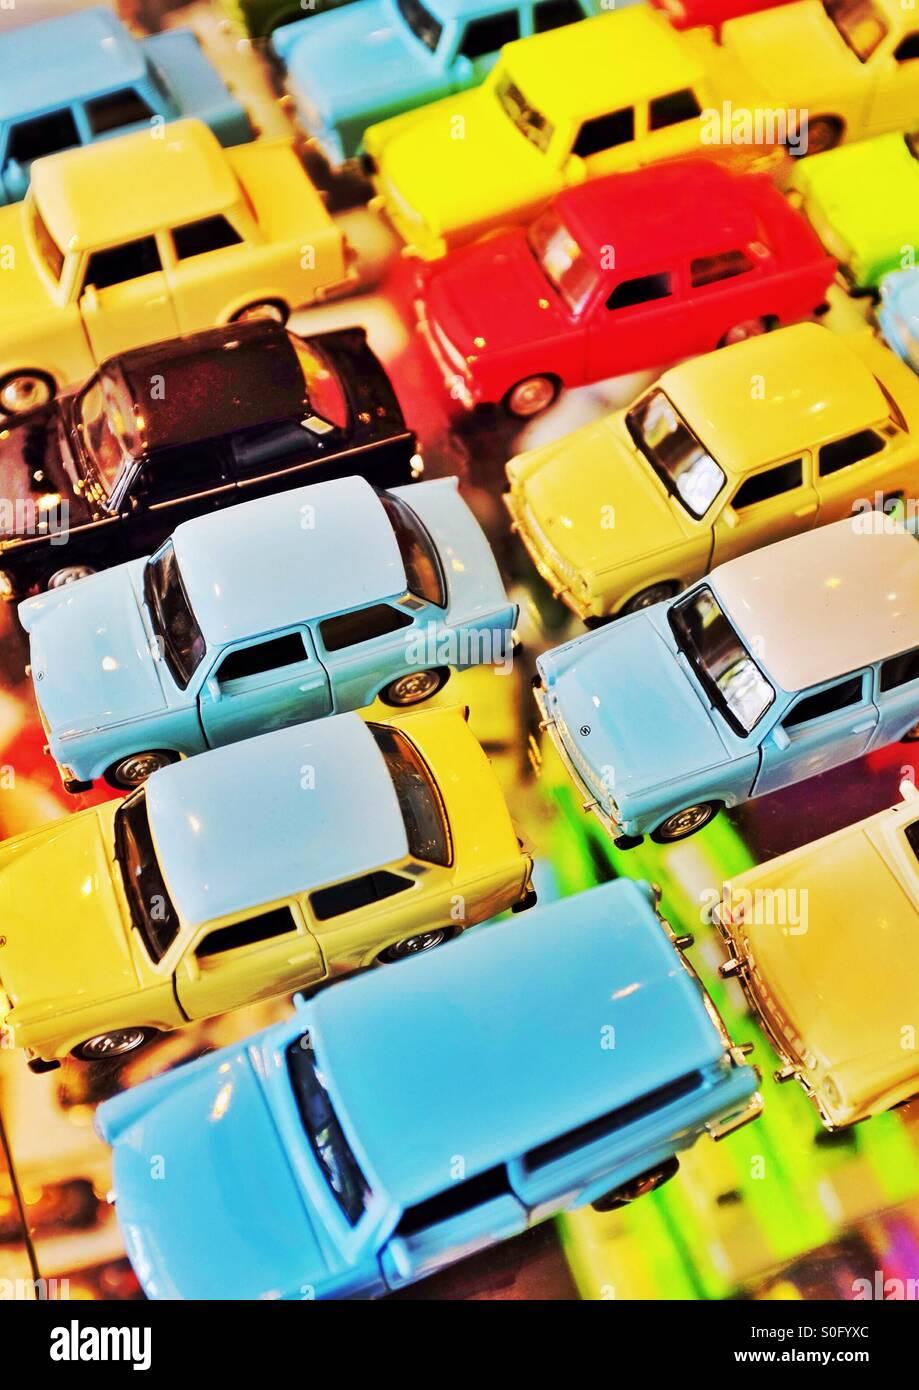 Selección de coches de juguete de colores brillantes Imagen De Stock